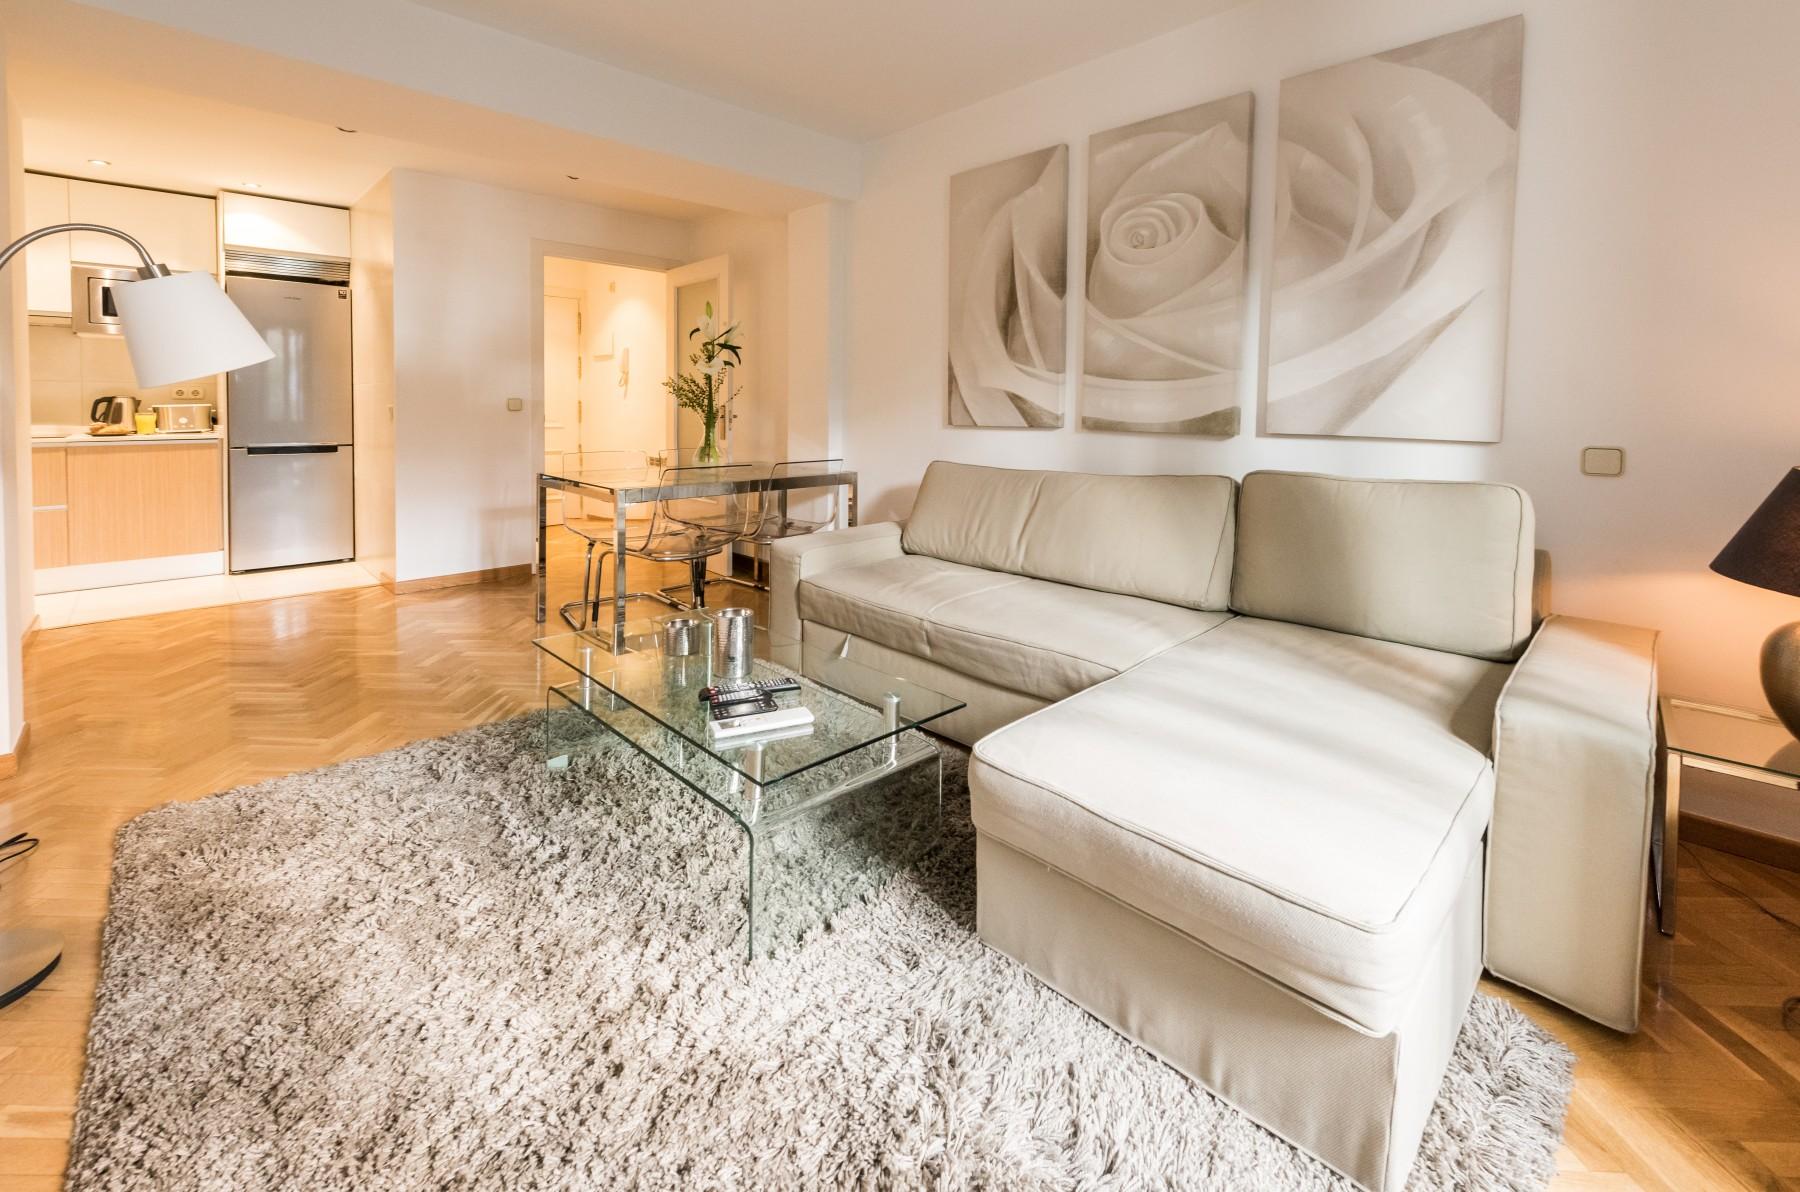 Malasaña Urban - MADFlats Collection - Apartments in Madrid